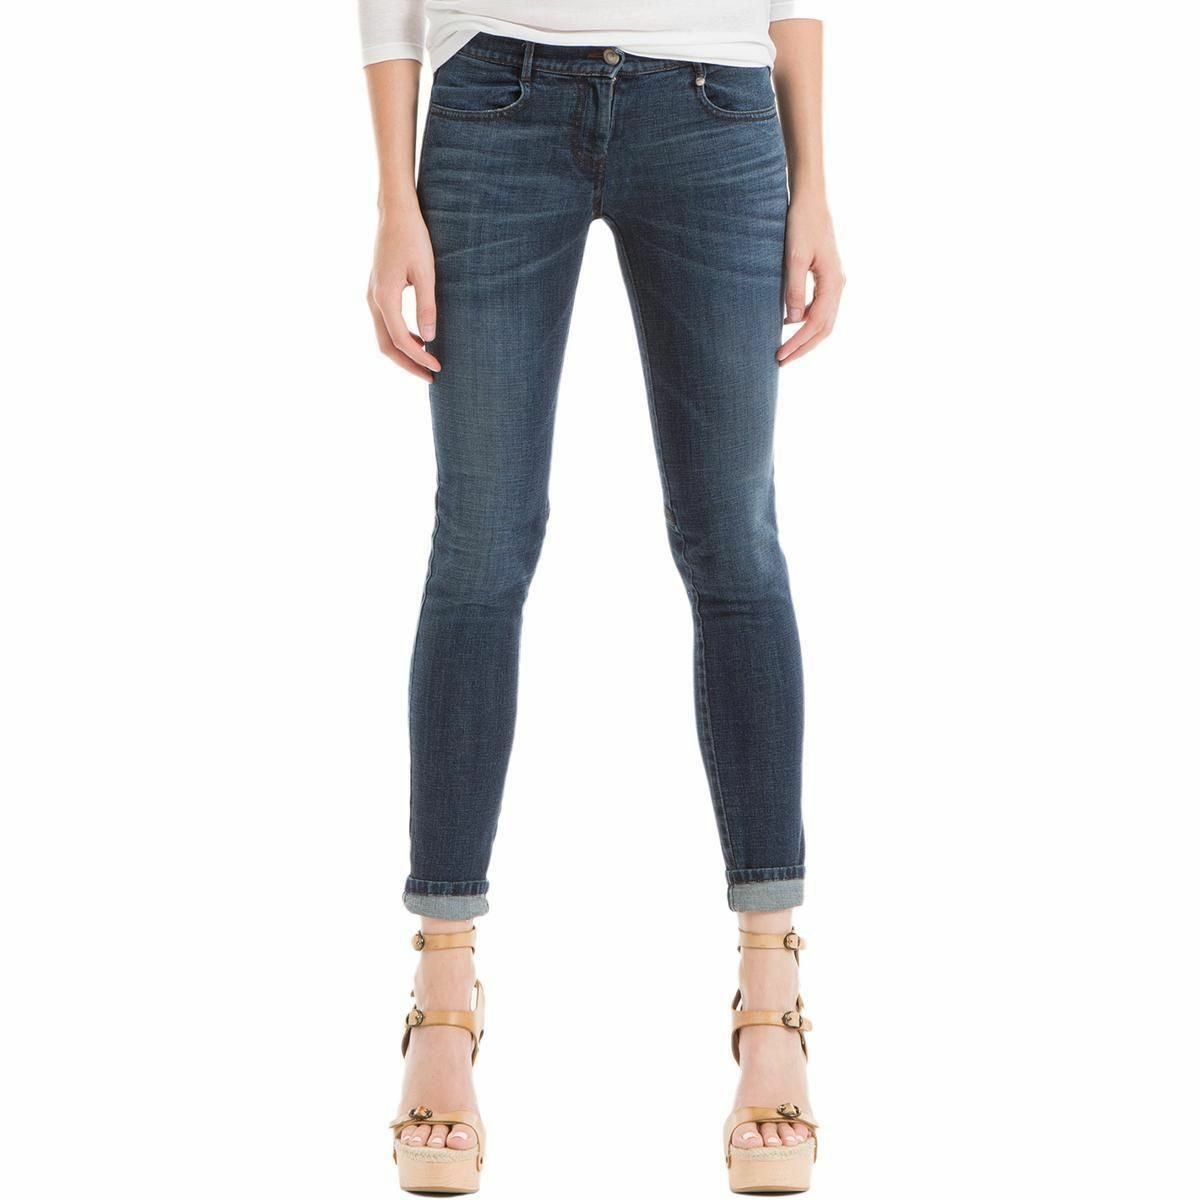 Max Studio London Womens Indigo Wash Skinny Jeans - Indigo Size 27 NWT